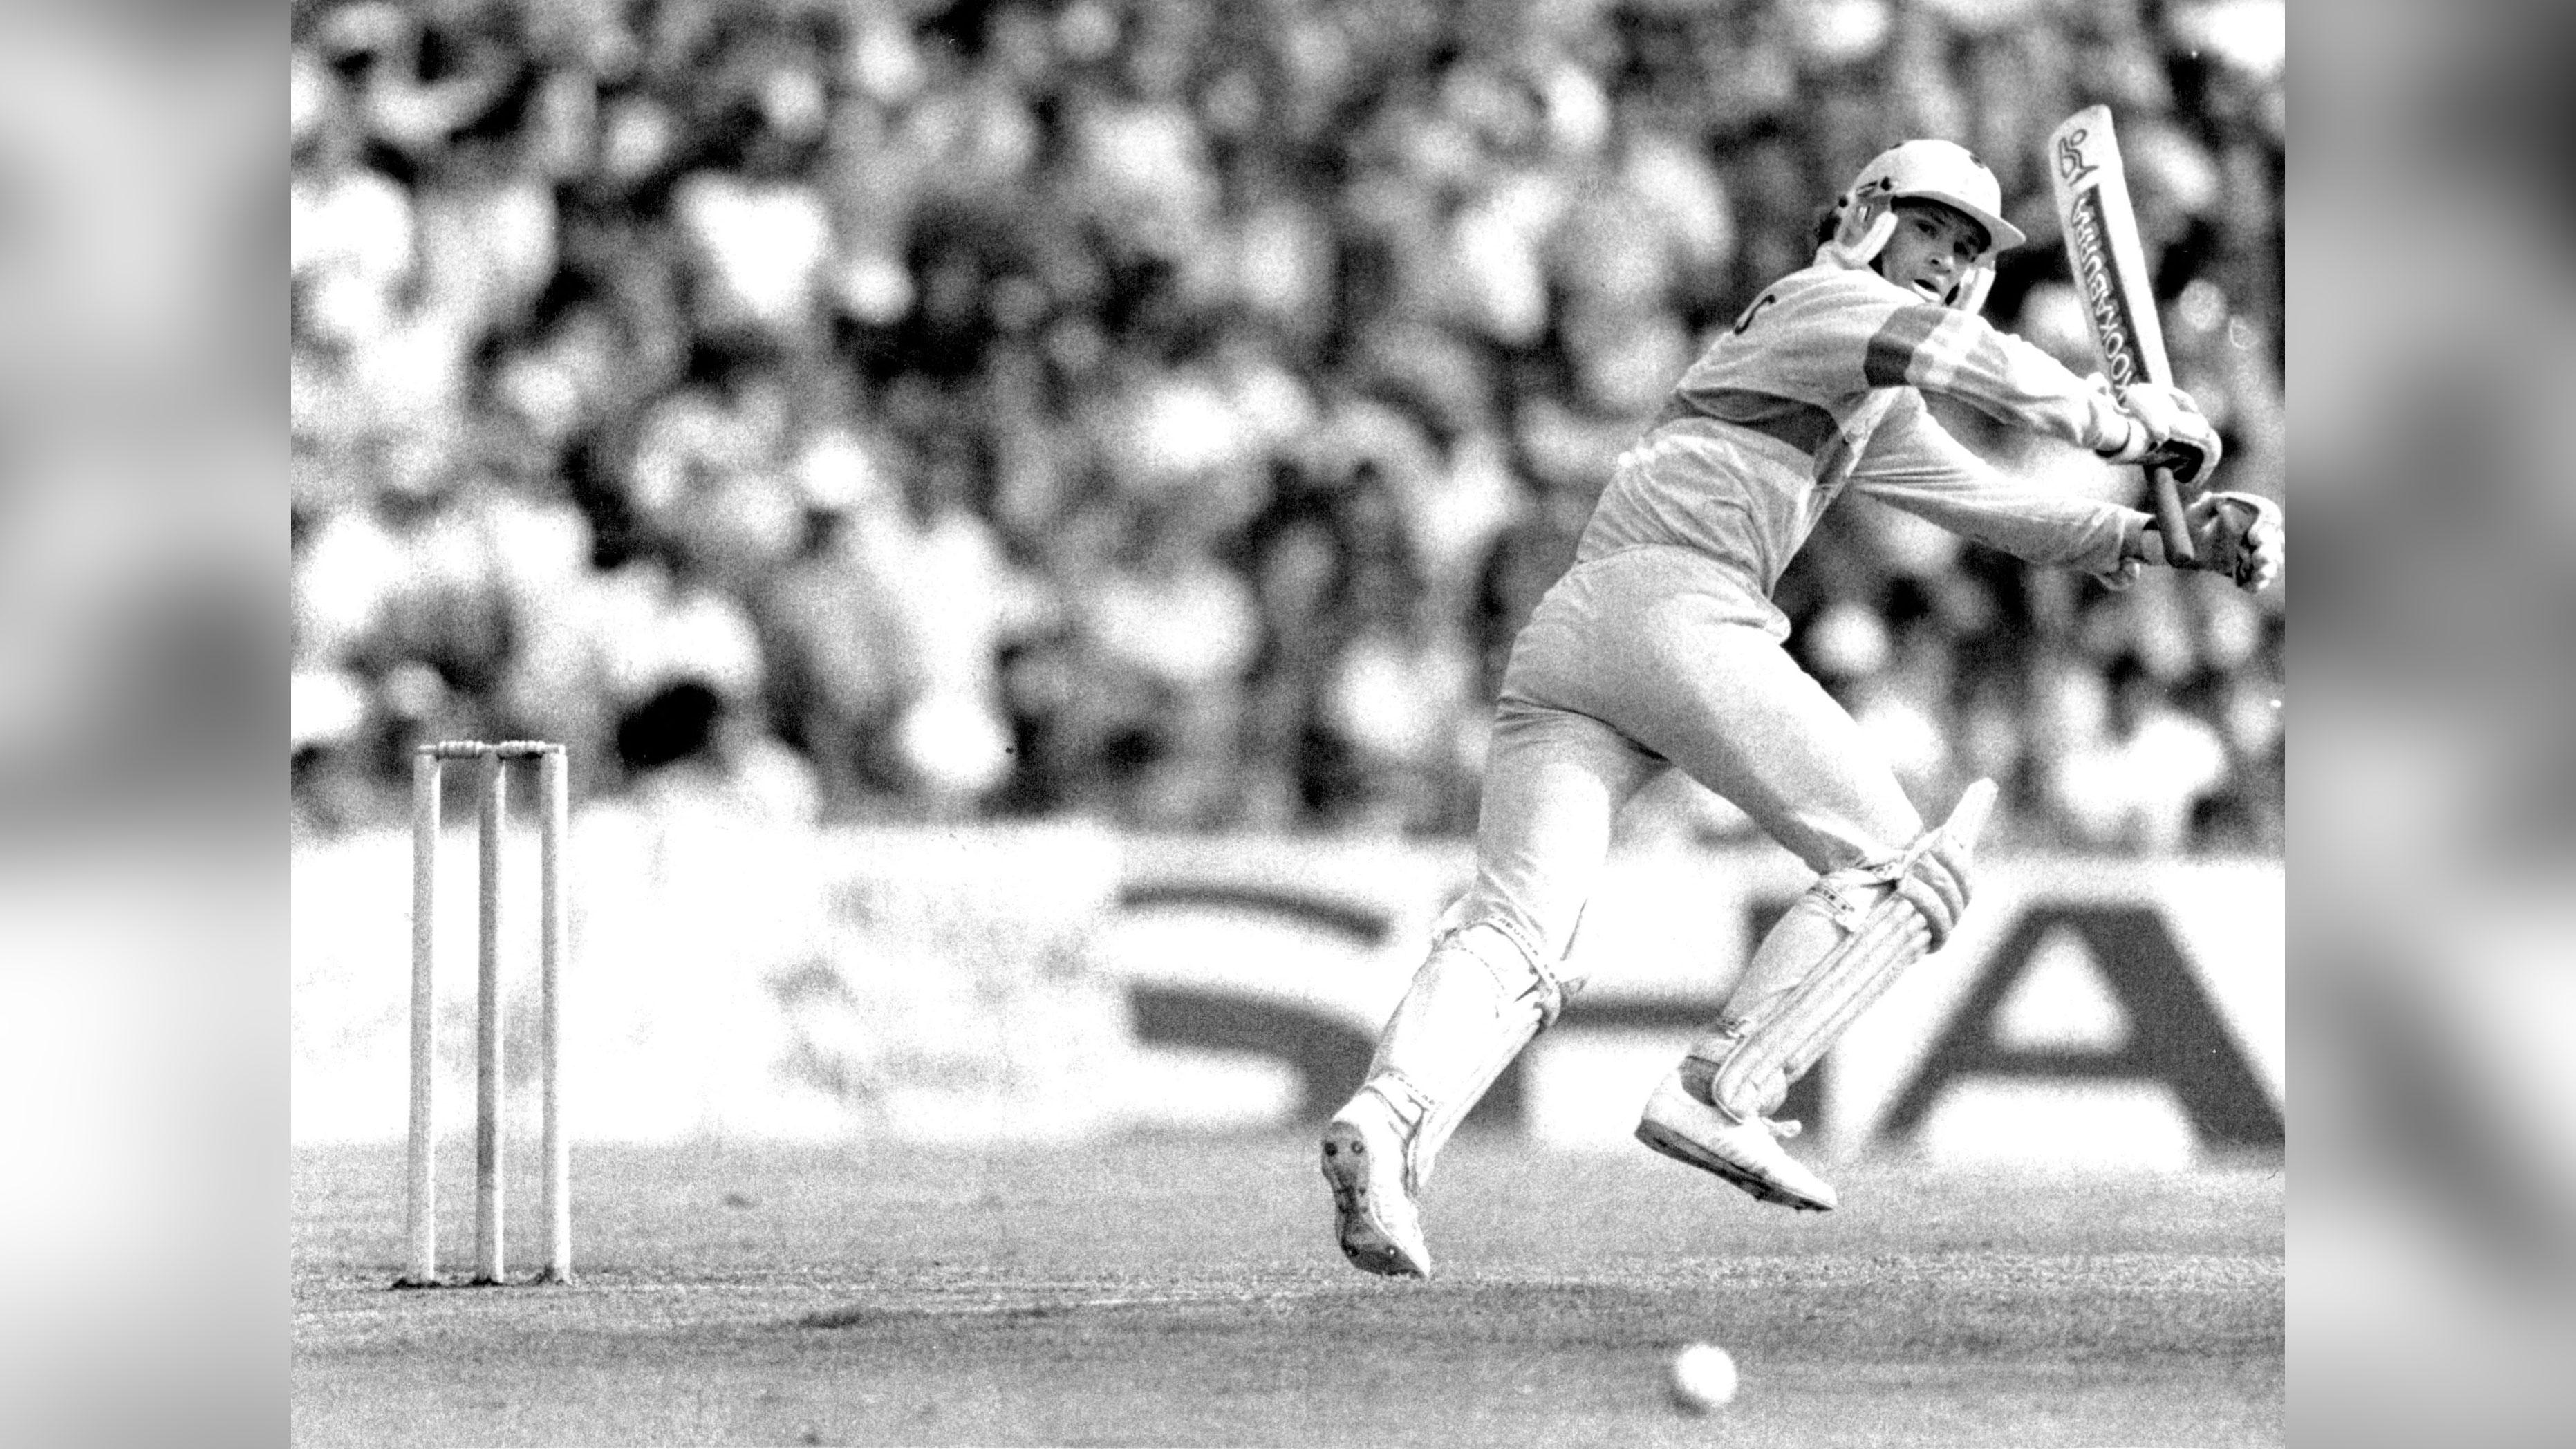 Australian cricket legend Dean Jones dies aged 59